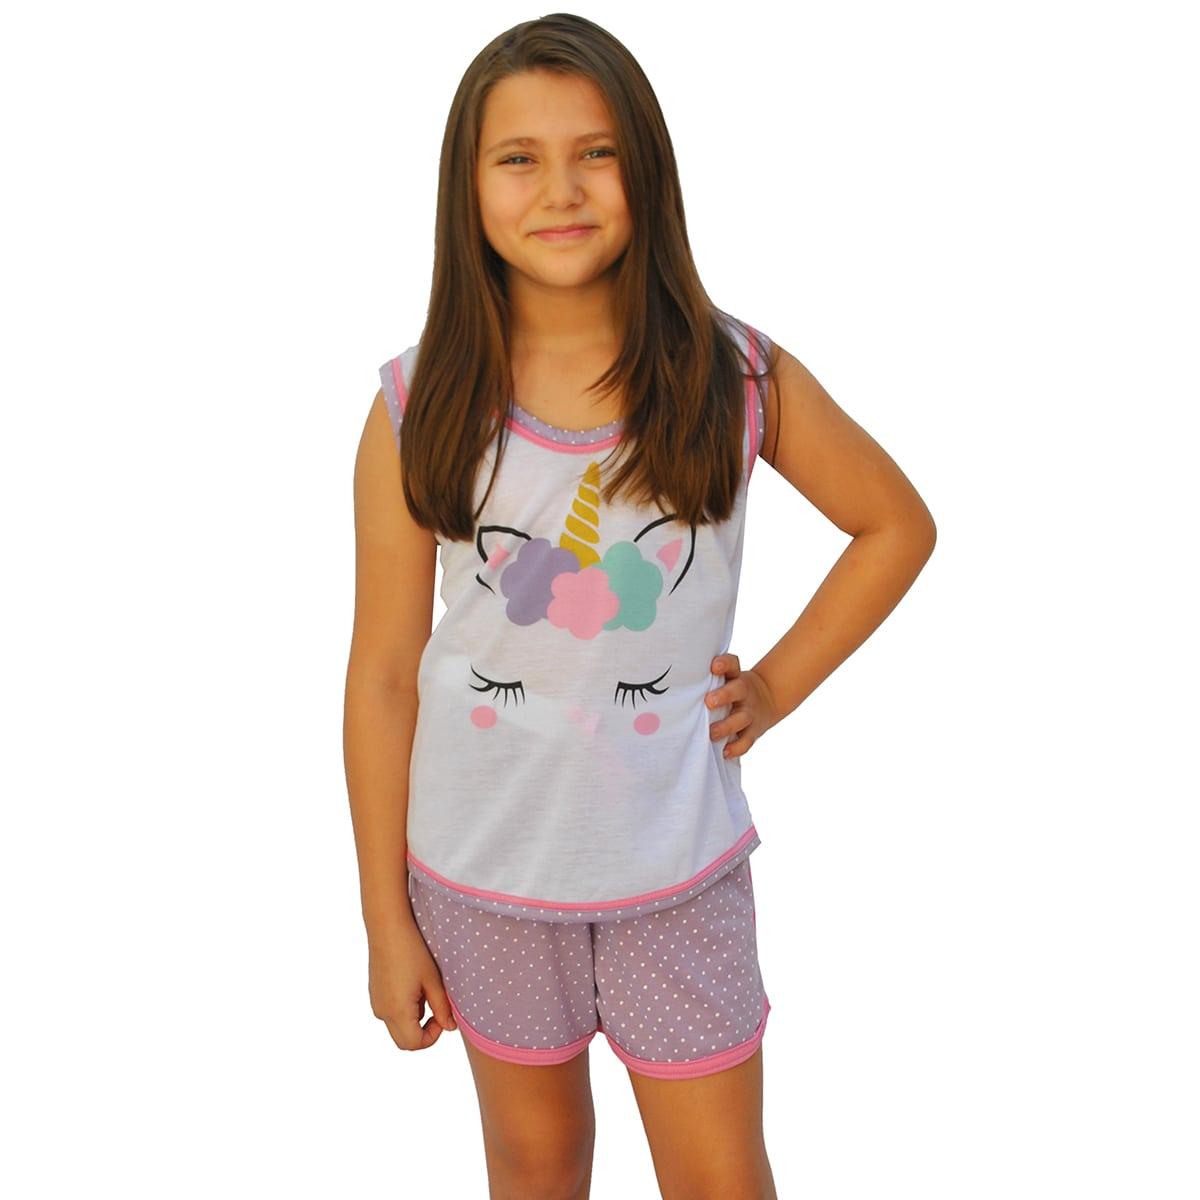 Baby Doll Short Doll Camiseta Feminino Infantil Unicórnio Minnie Ref: 026